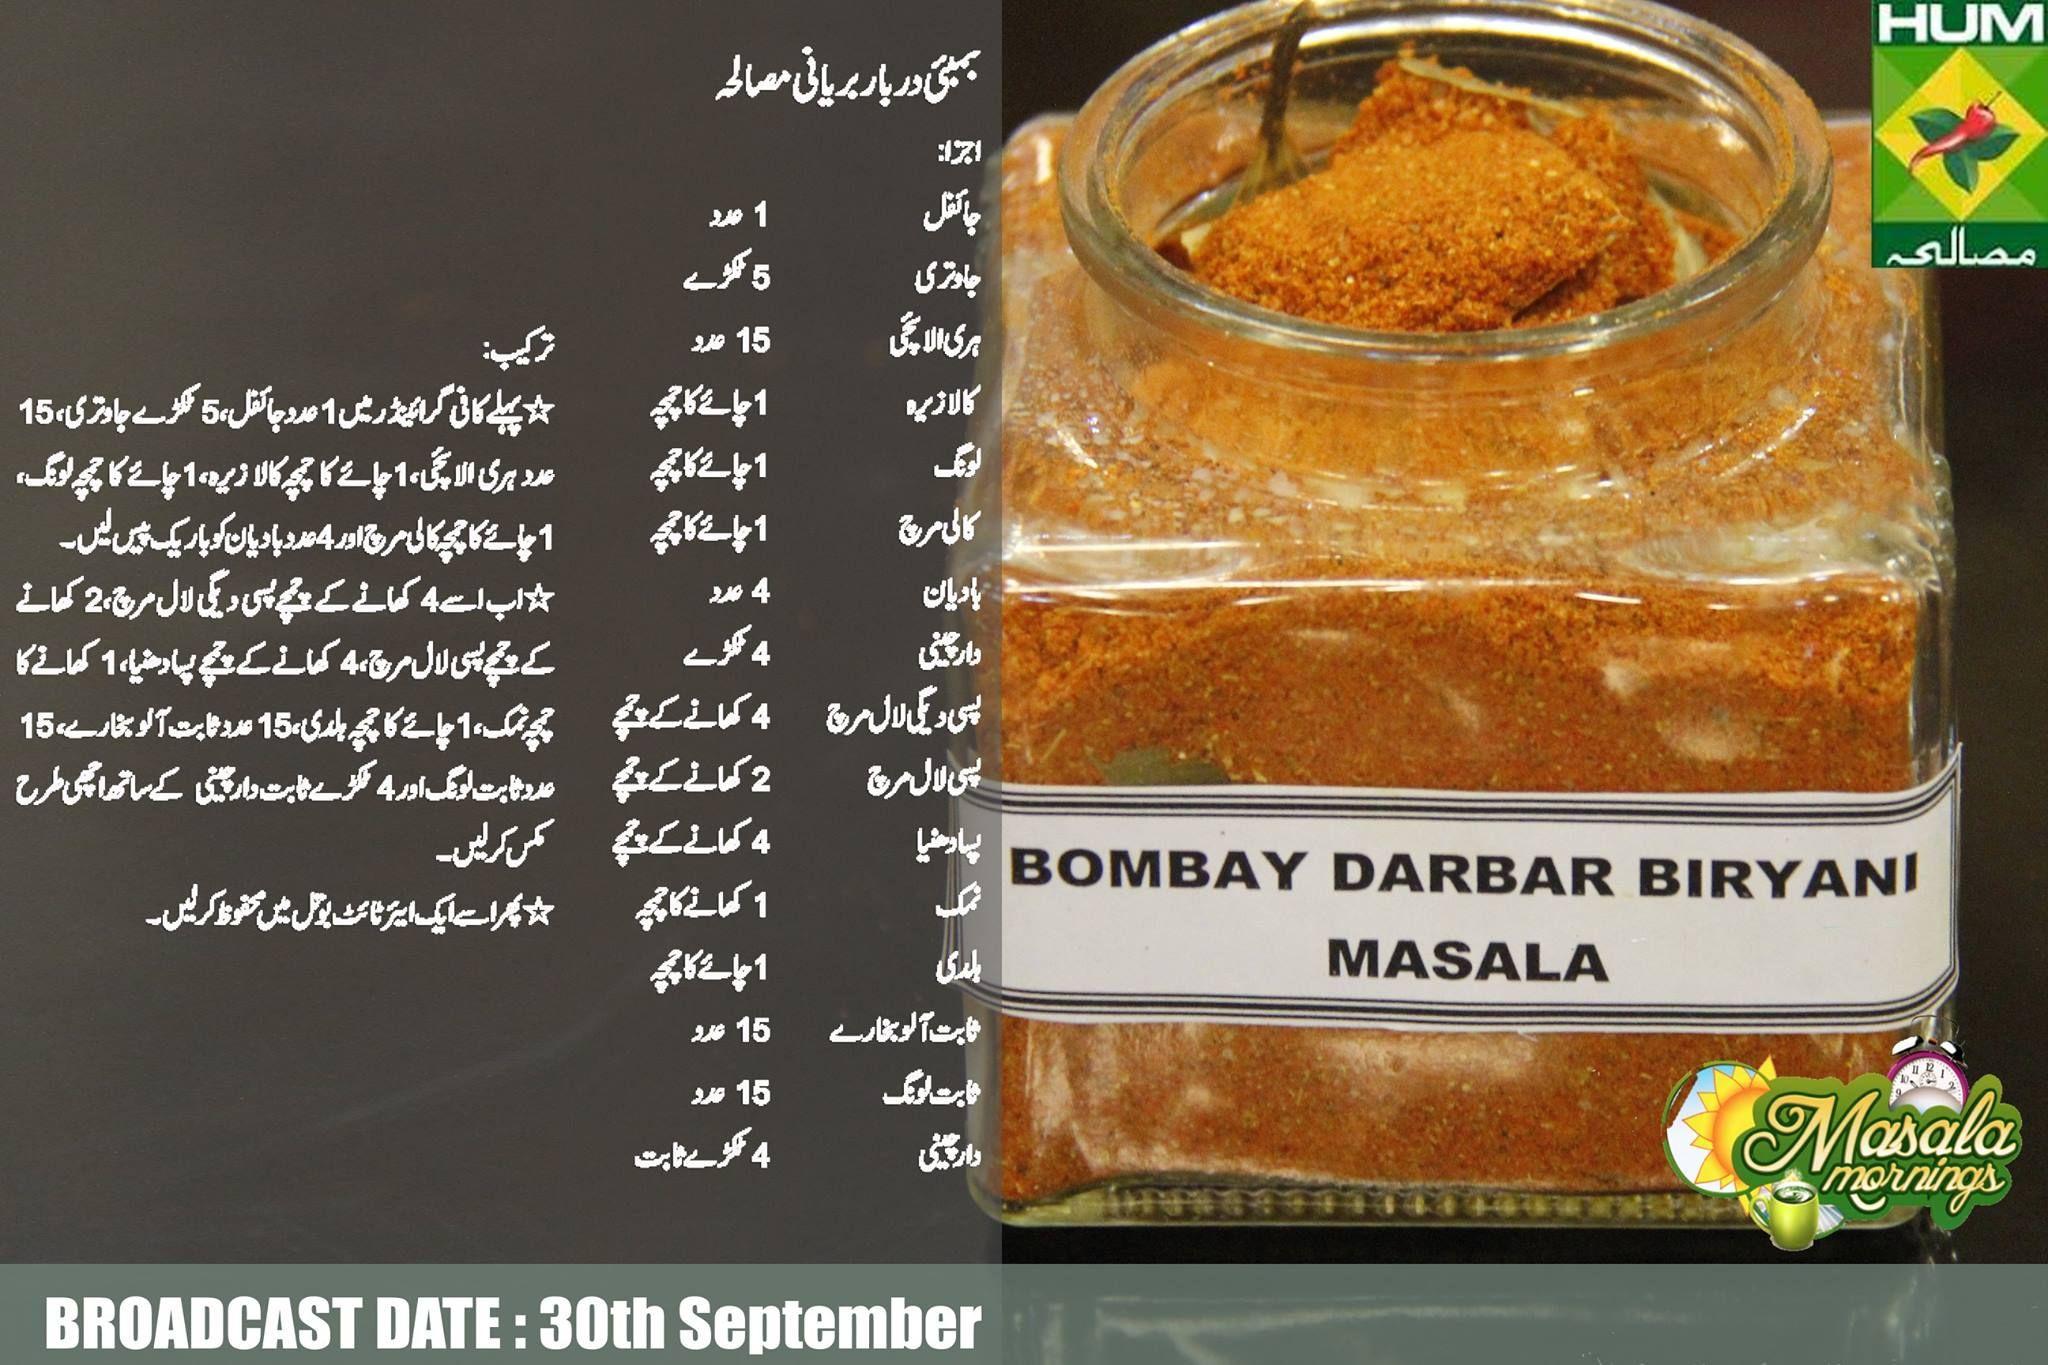 Biryani masala masalay pinterest biryani recipes and pakistani cuisine biryani masala by shireen anwar ccuart Gallery